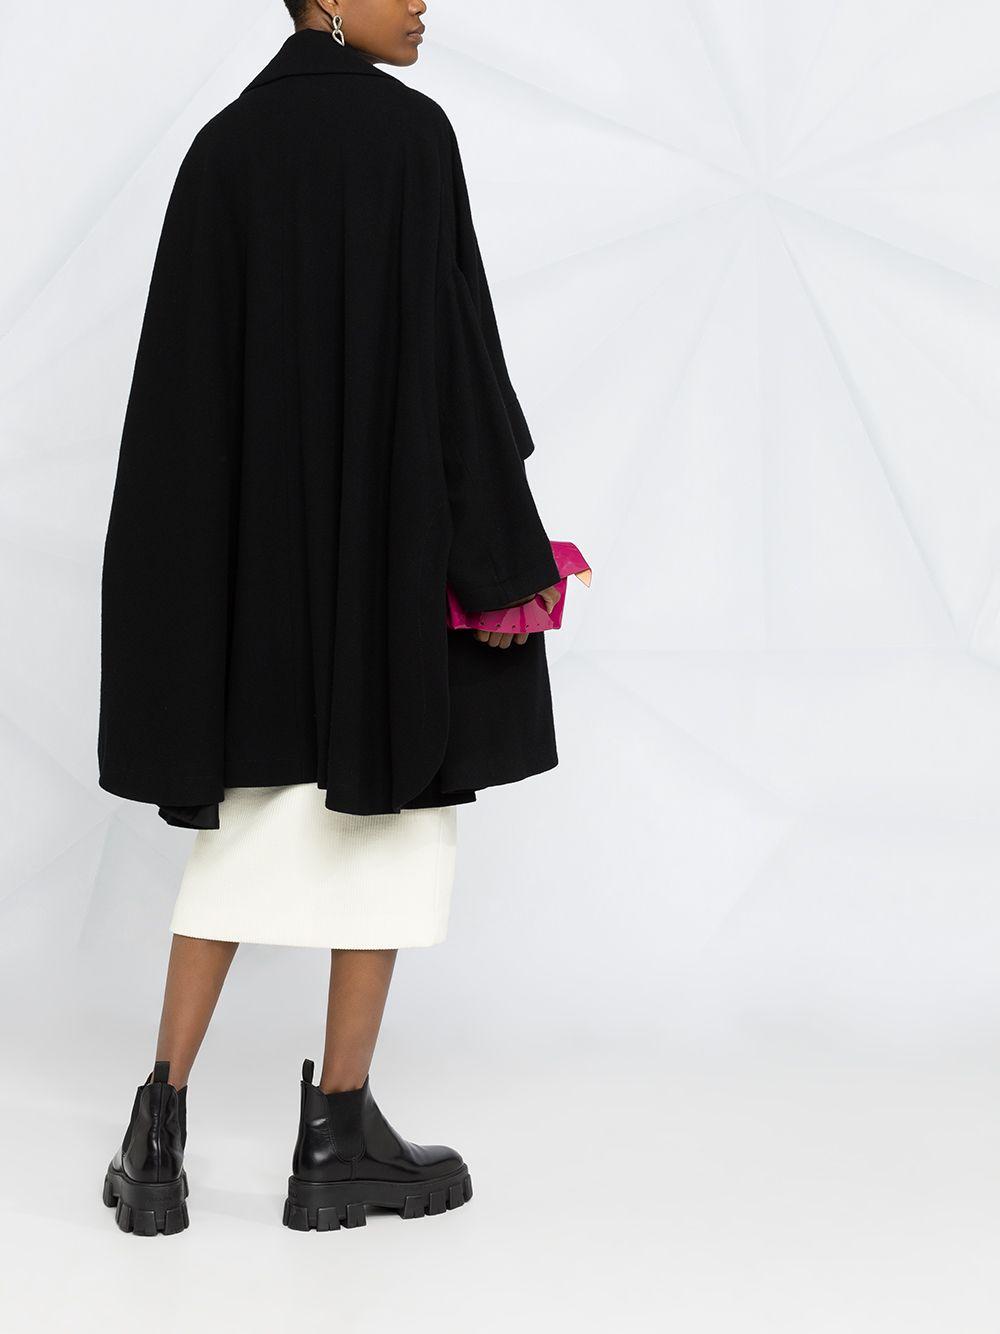 Cappotto oversize NOIR KEI NINOMIYA | Cappotto | 3F-C009-0511